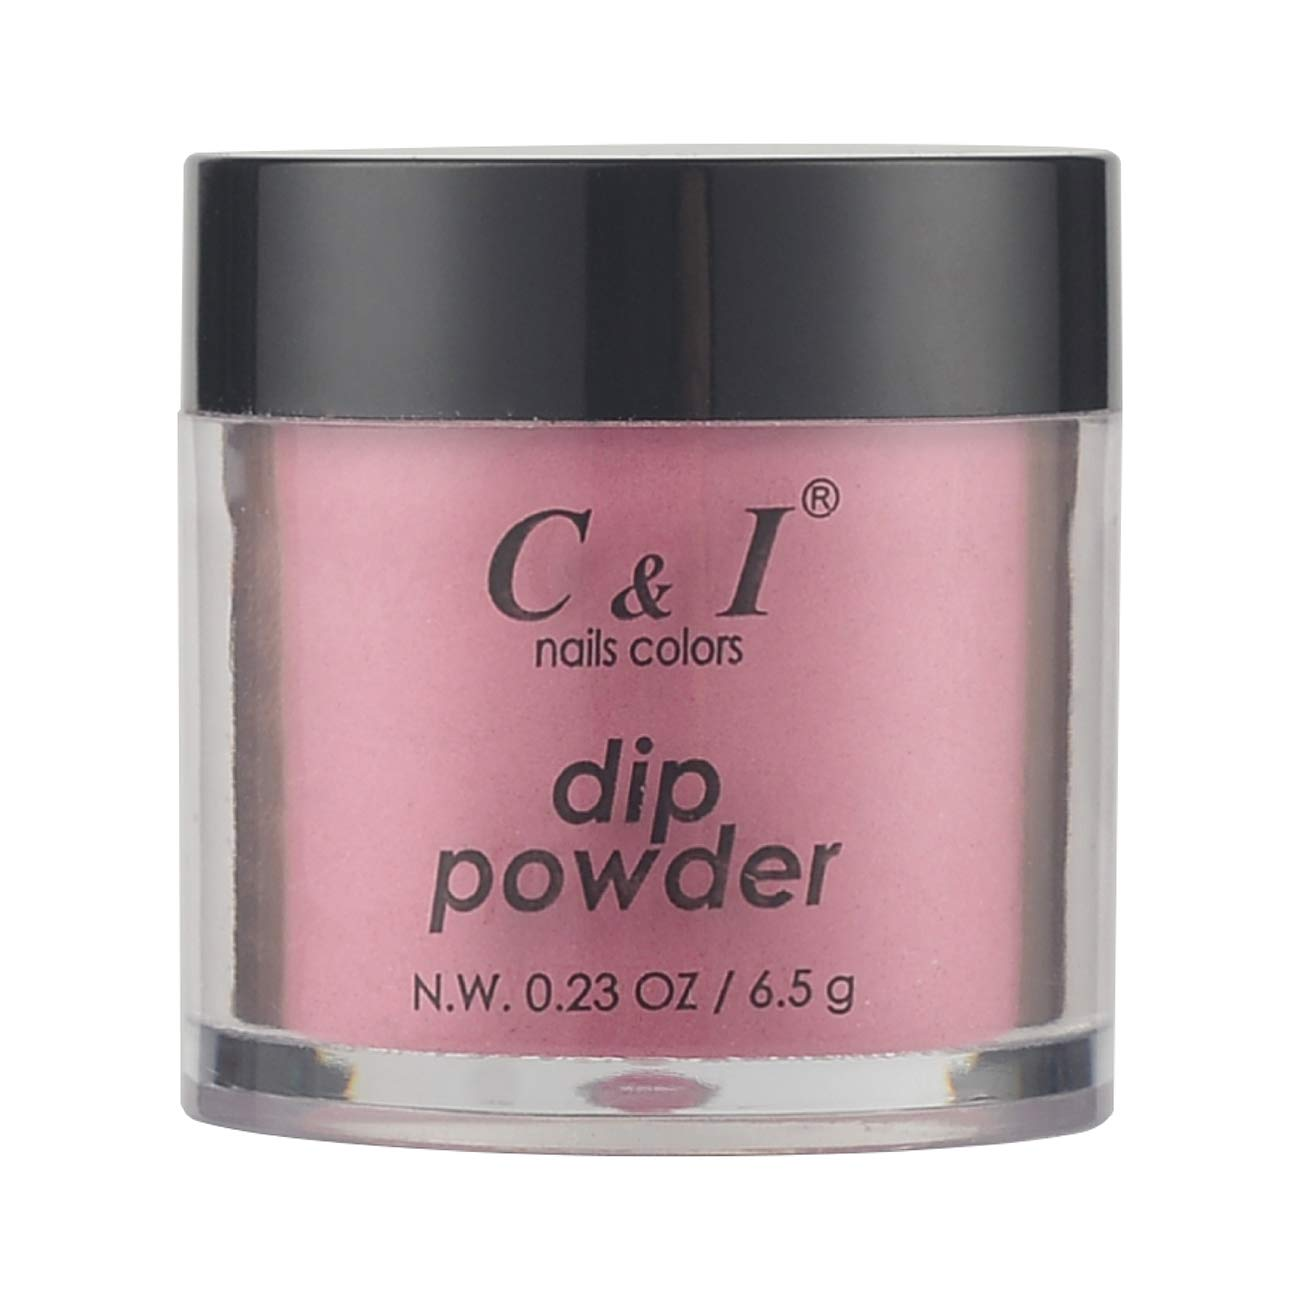 C & I Dipping Powder, Nail Colors, Gel Effect, Color # 52 Rose-Carmine, 0.23 oz, 6.5 g, Purple Color System (4 pcs)